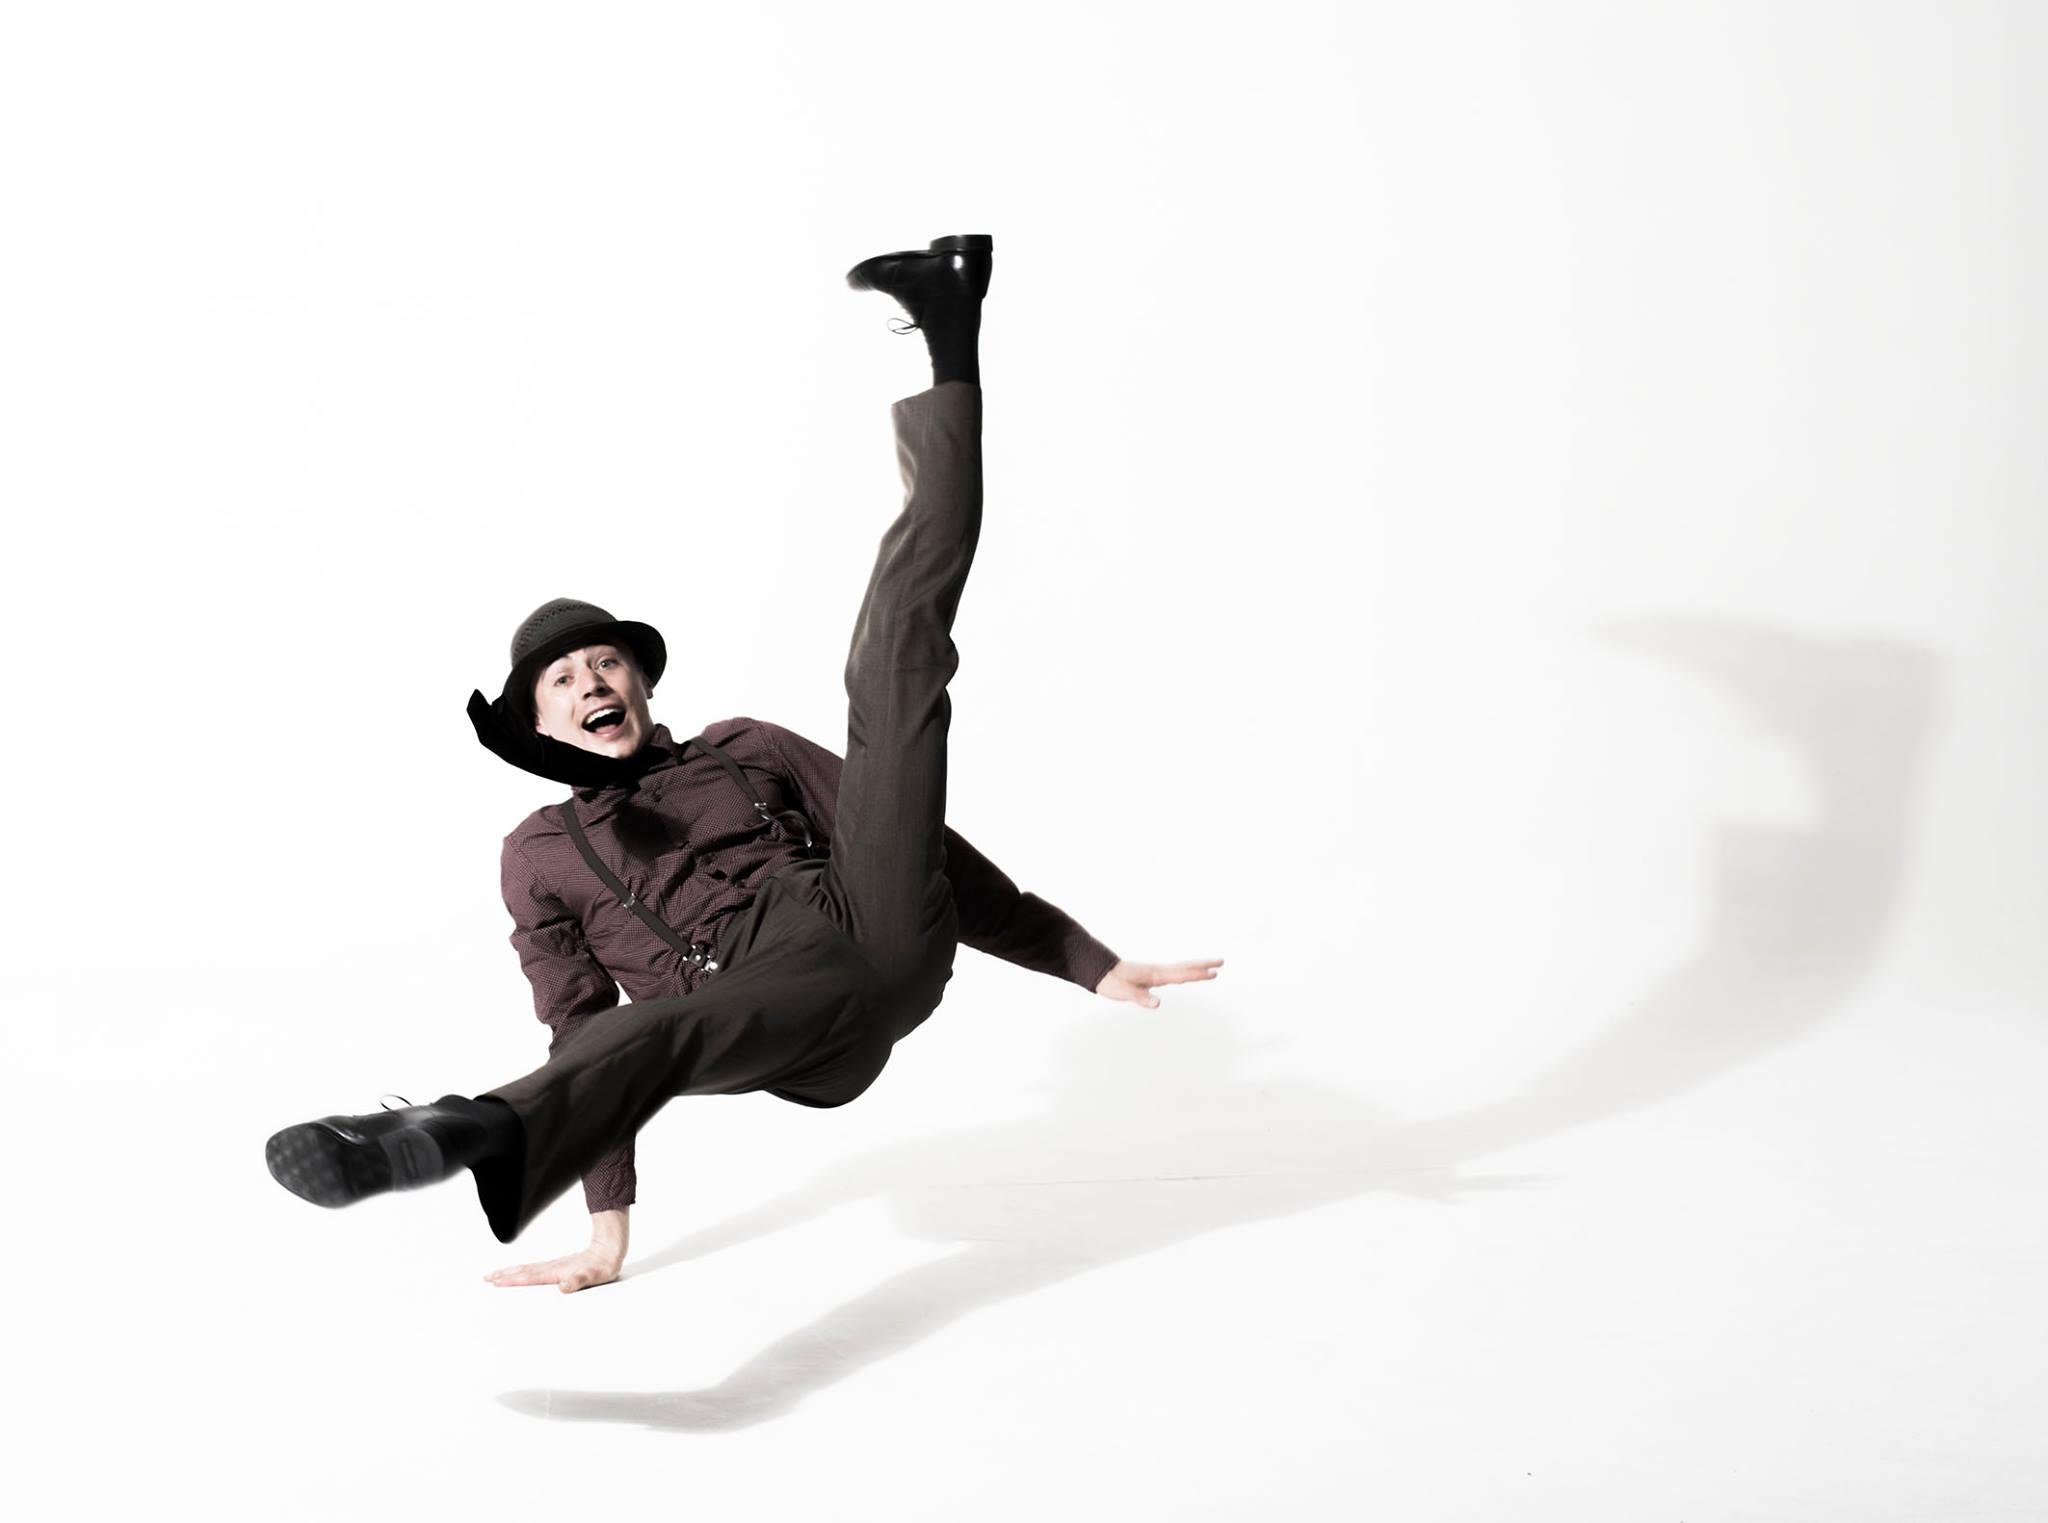 Tanz, Akrobatik, Artistik, Kinder, Spass, Unterhaltung, Comedy